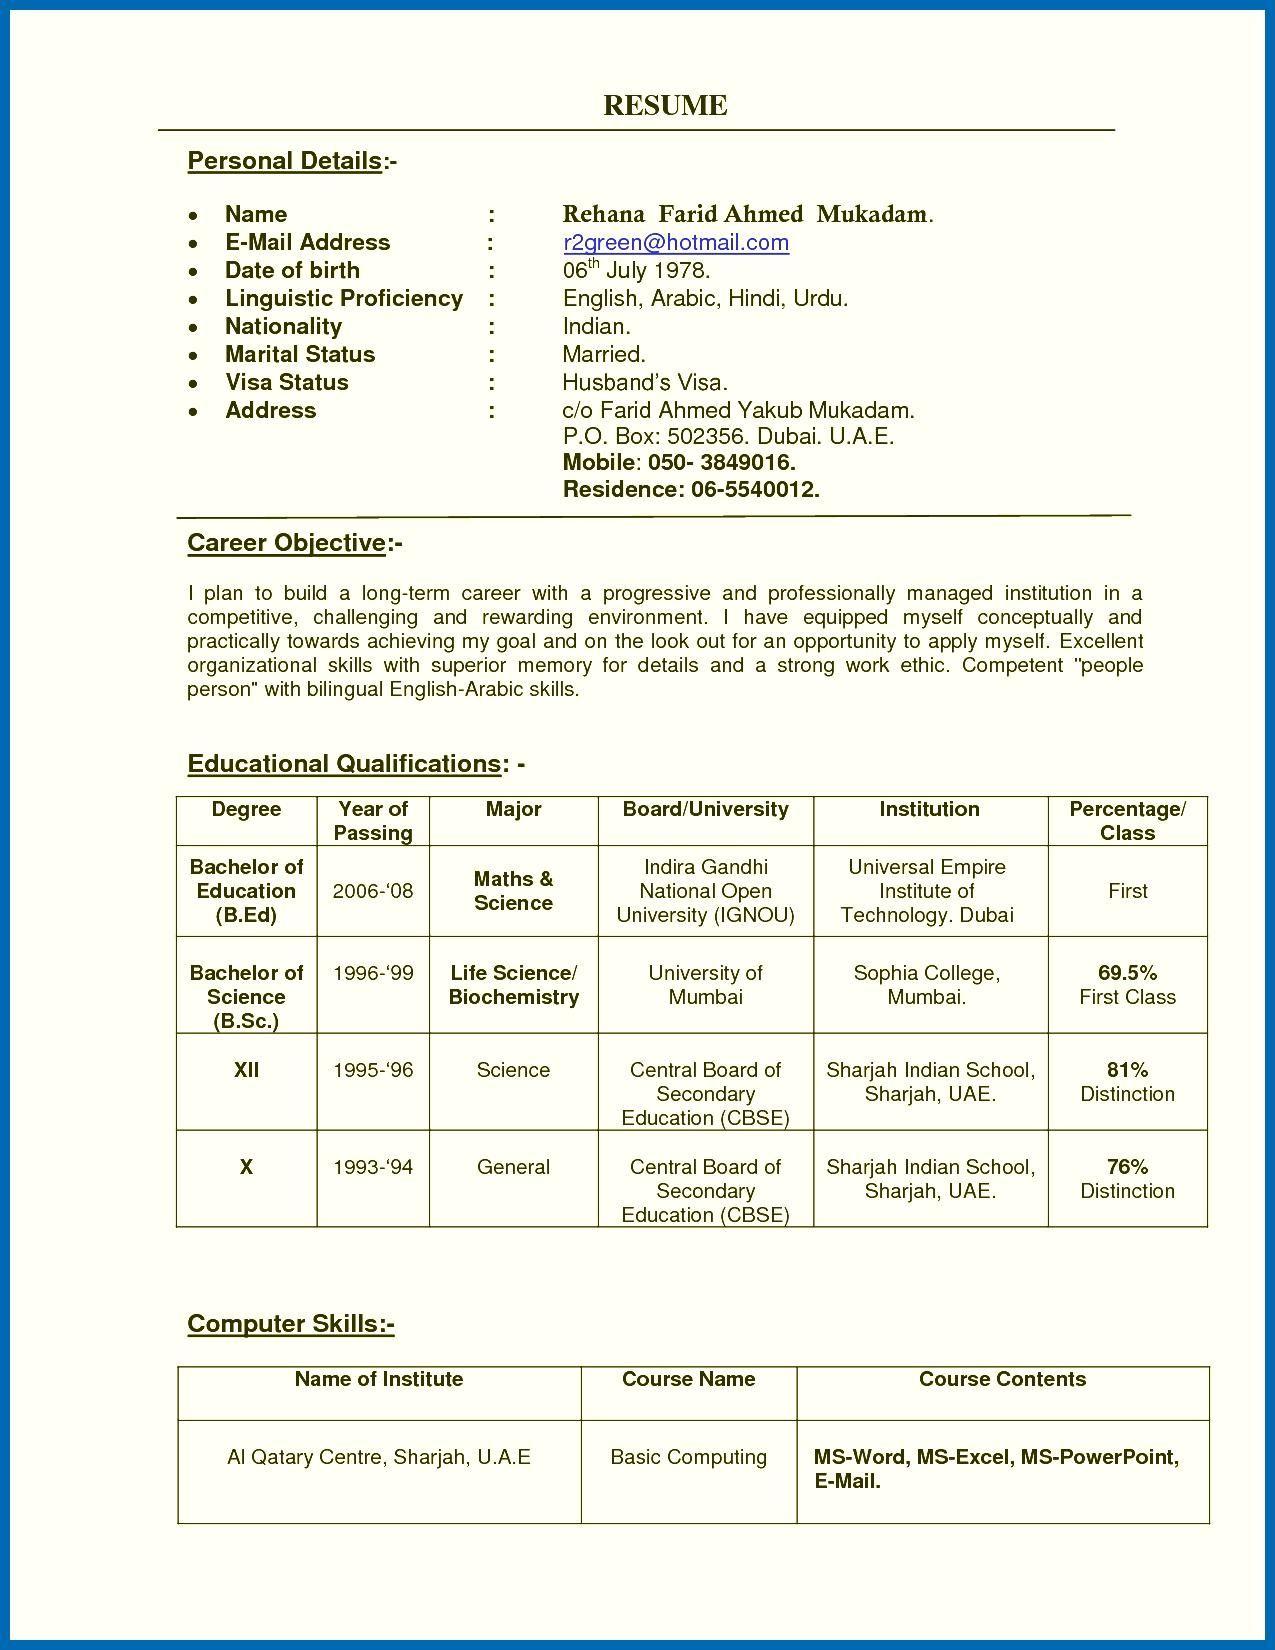 resume education format india